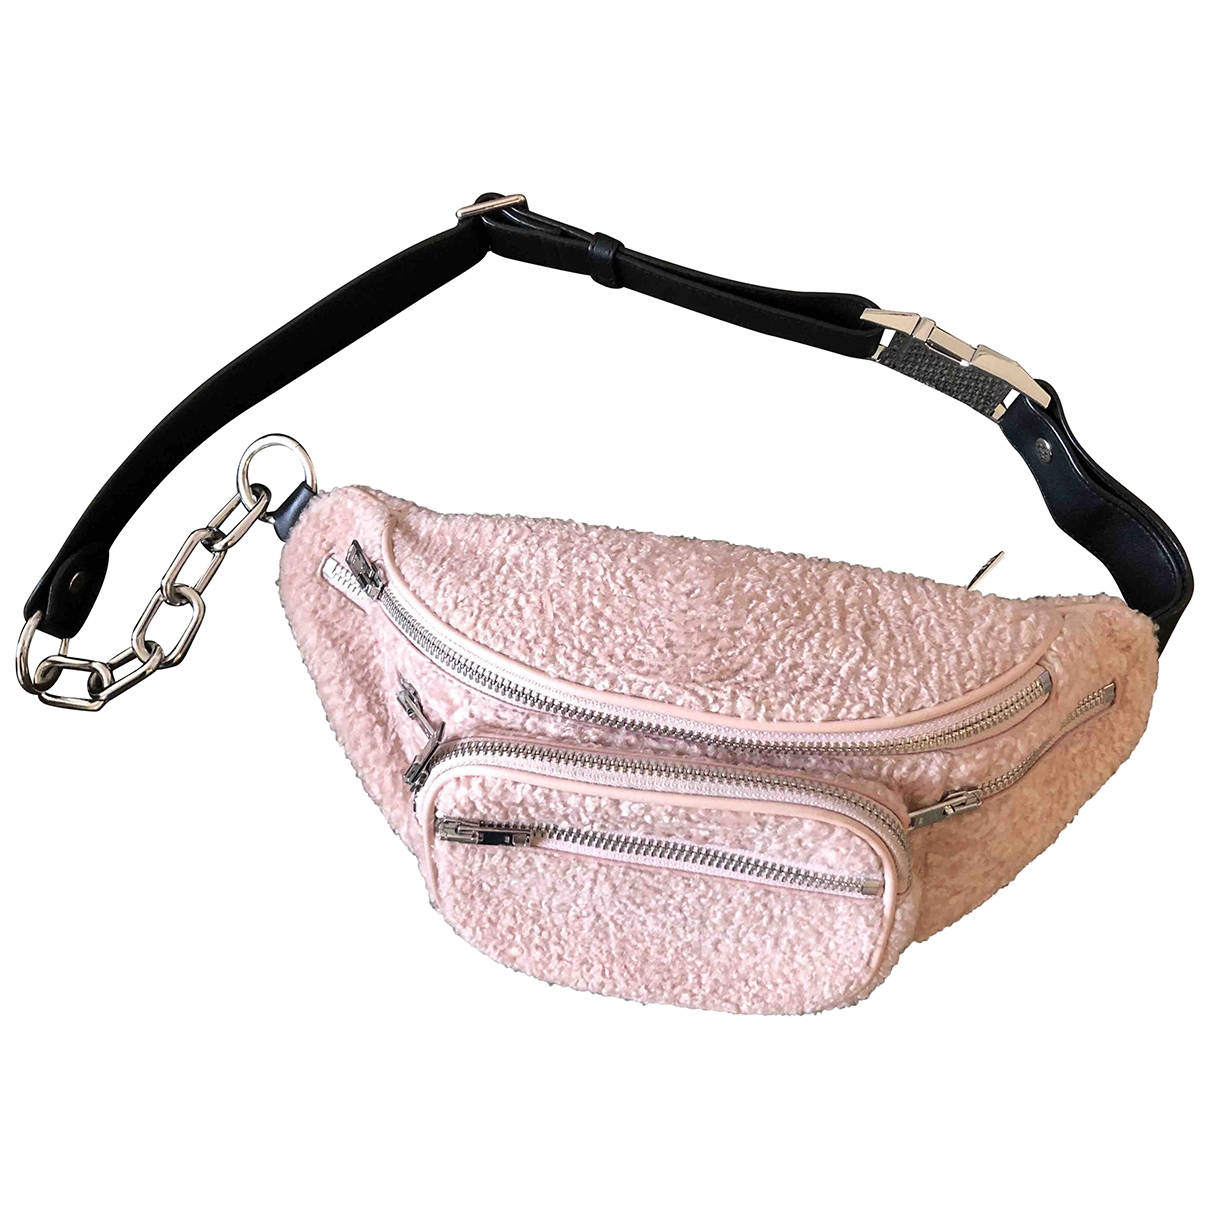 Alexander Wang Attica Handtasche in  Rosa Synthetikpelz